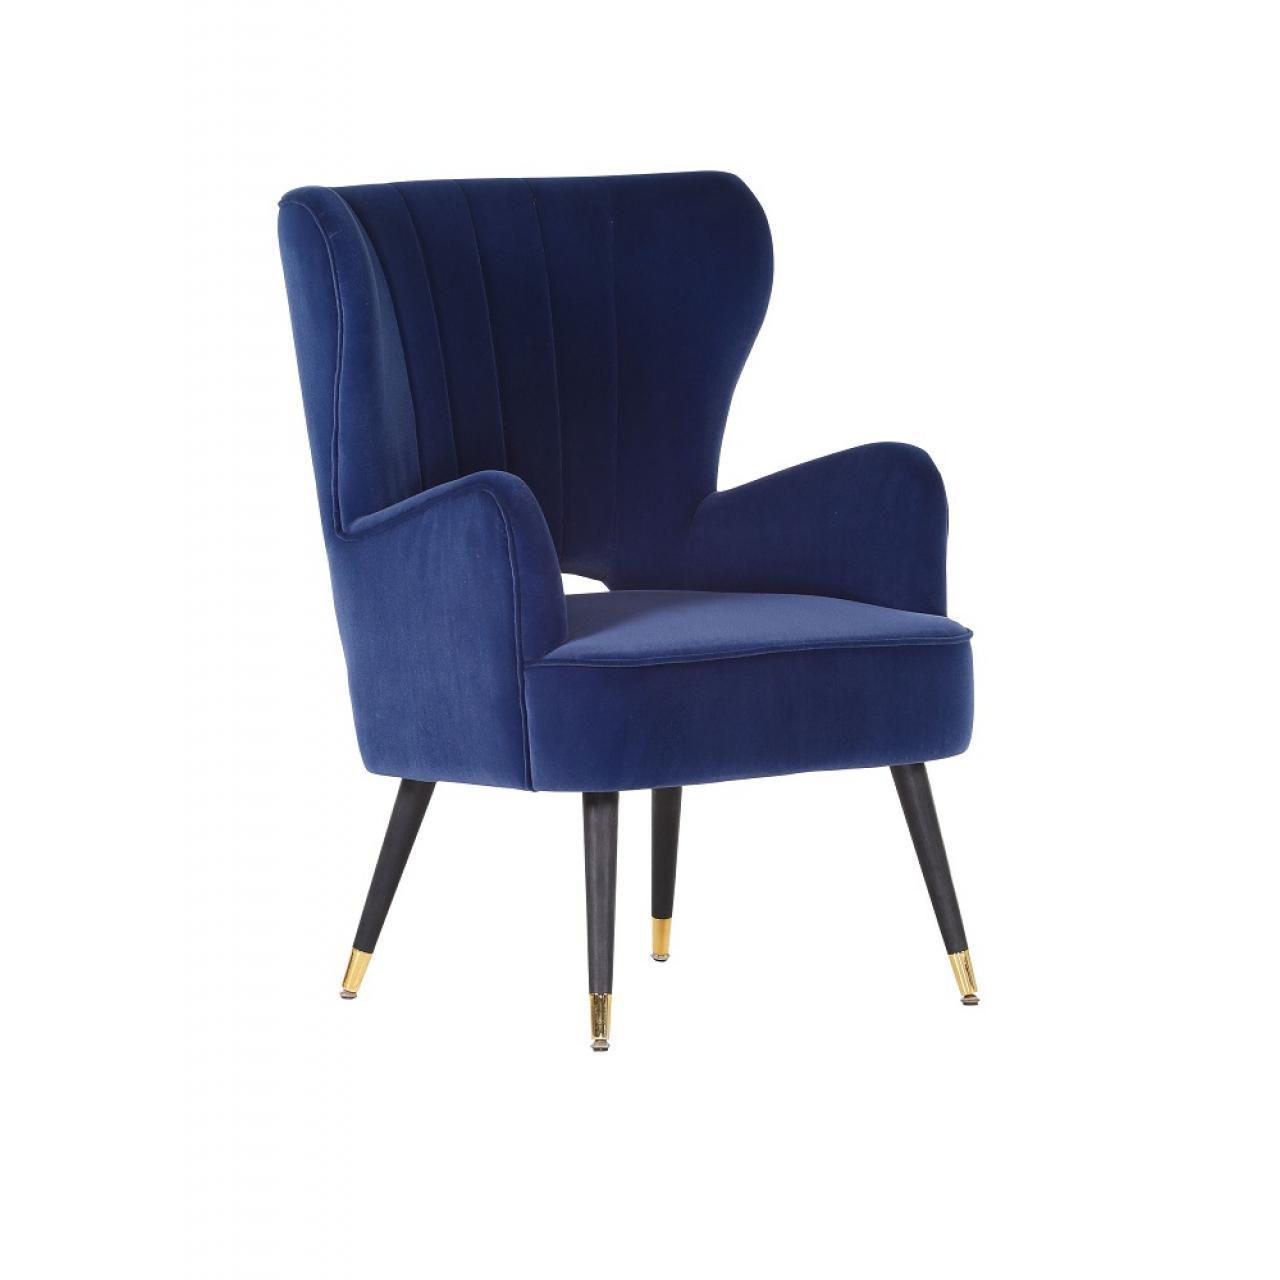 Sessel Performer Blau Modern Fernsehsessel Wohnzimmer Relaxsessel